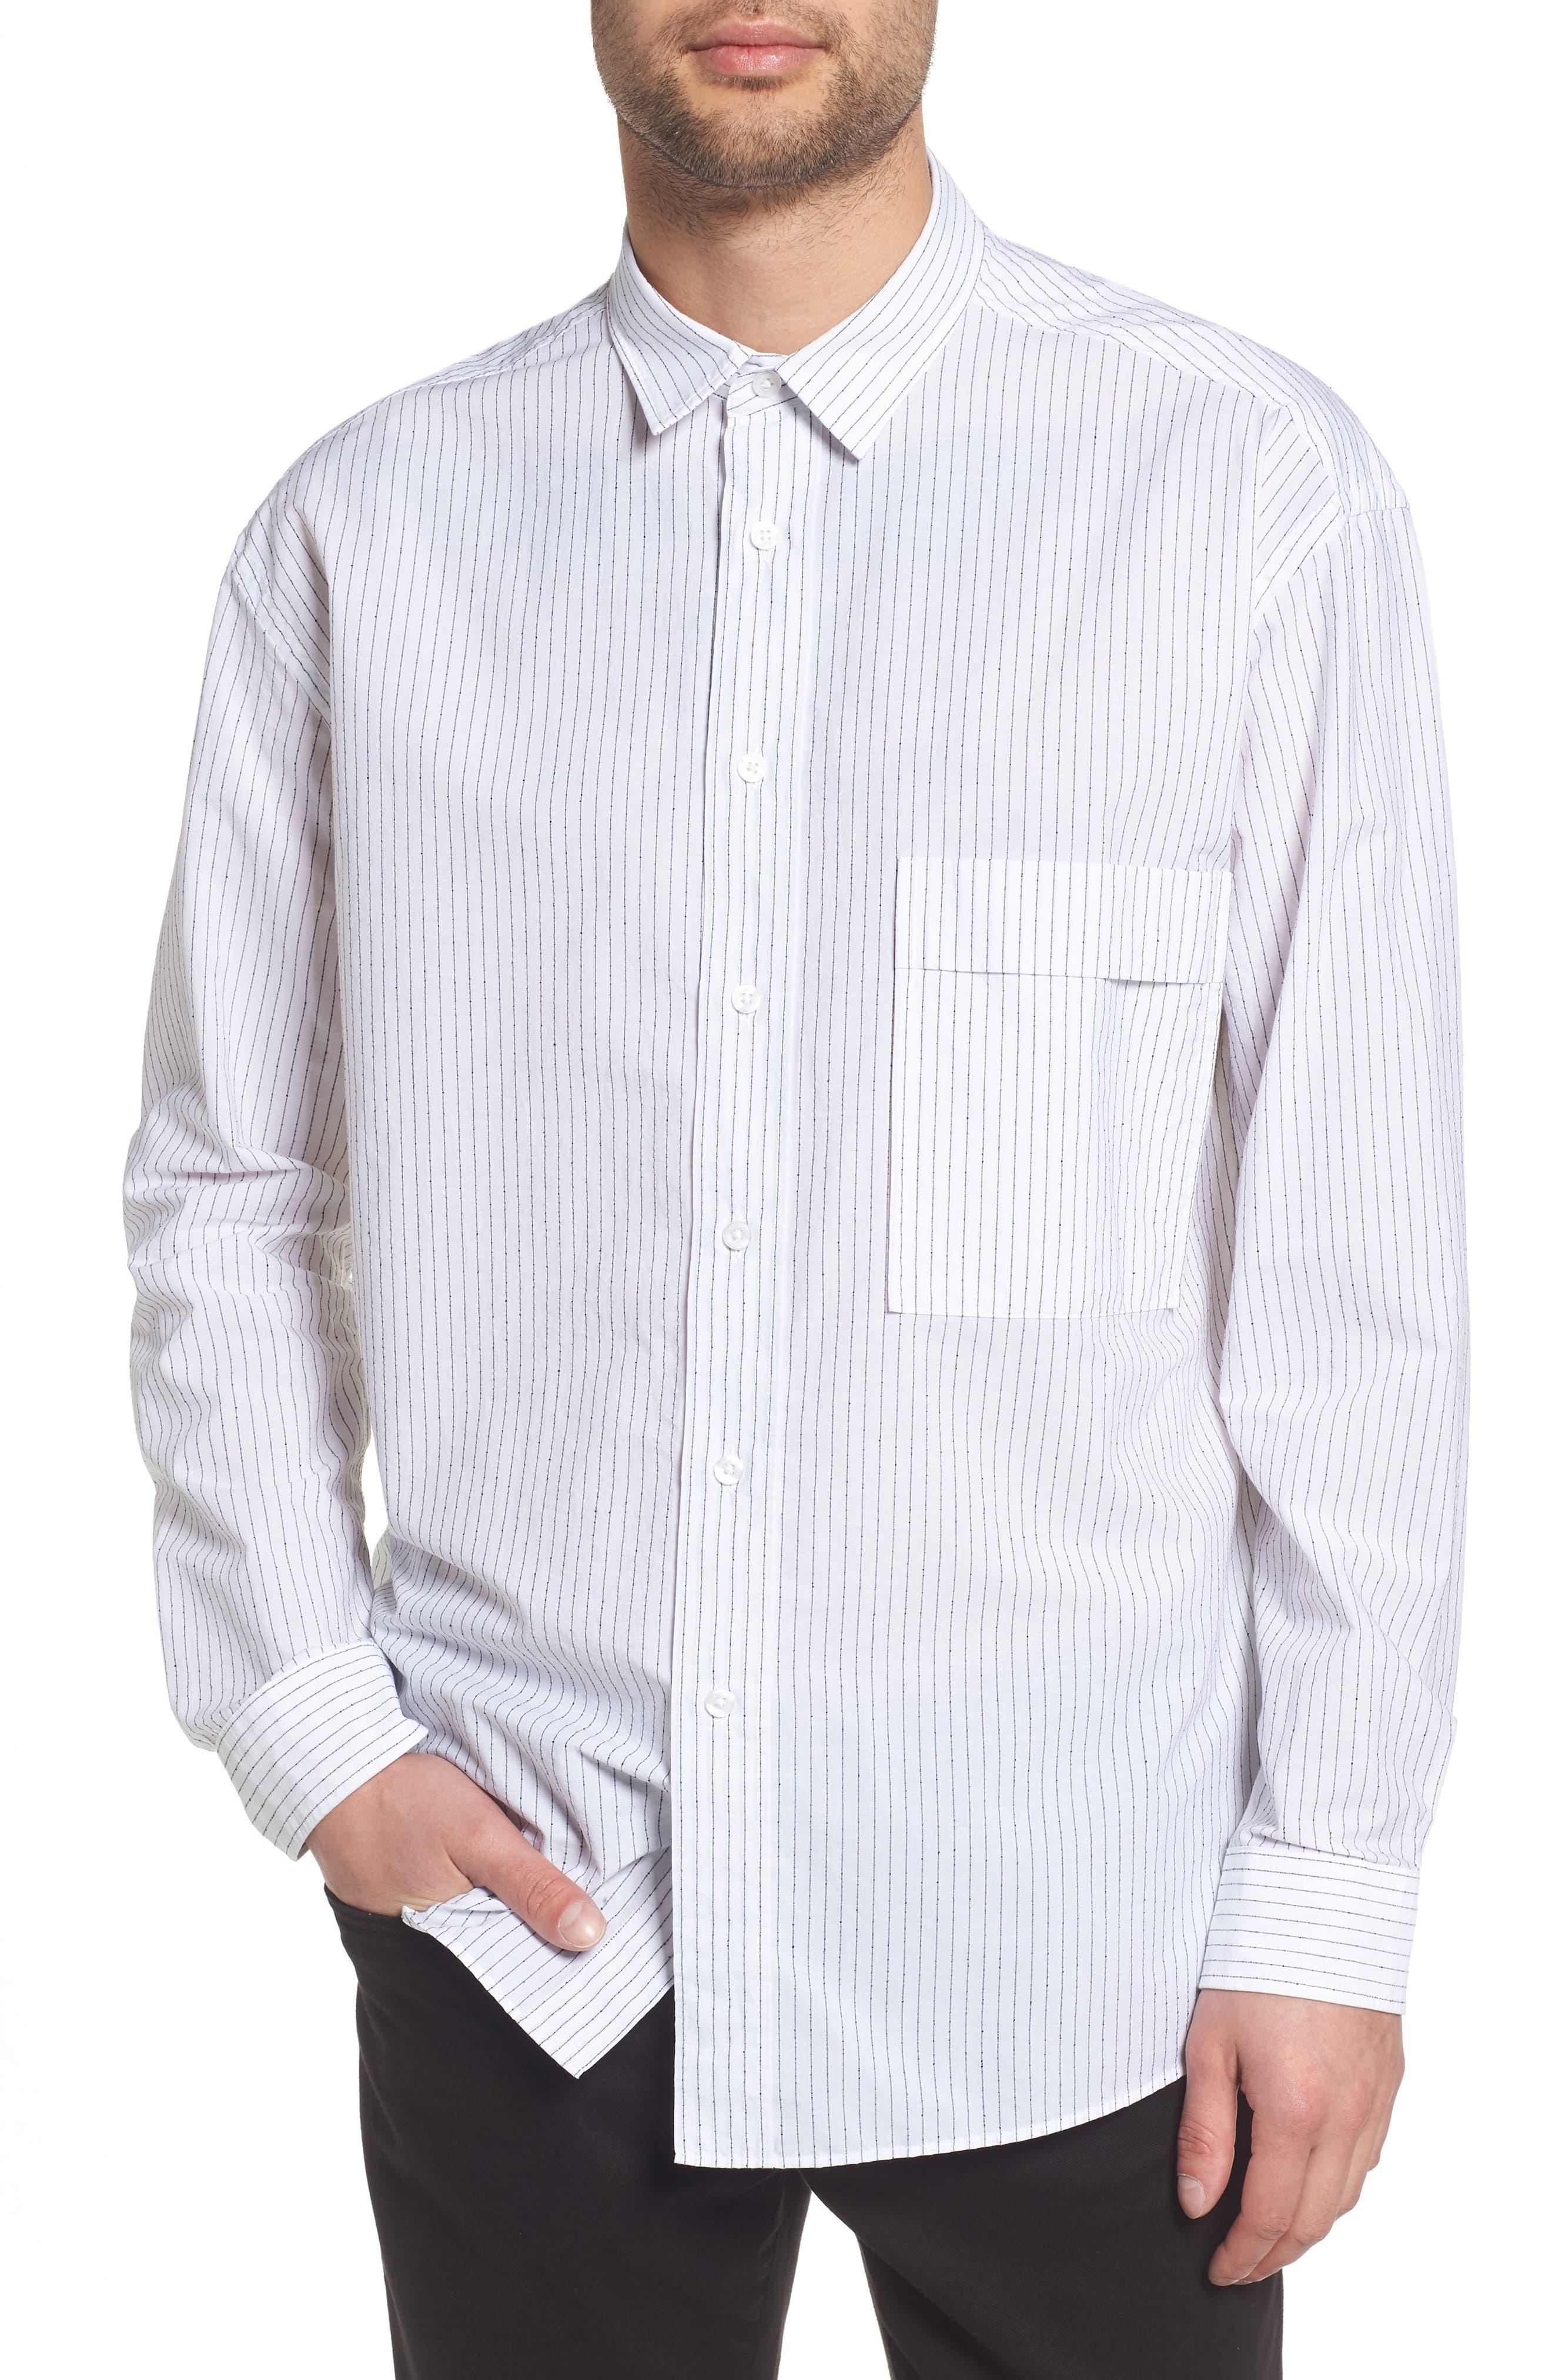 Ery Stripe Classic Fit Sport Shirt,                             Main thumbnail 1, color,                             WHITE